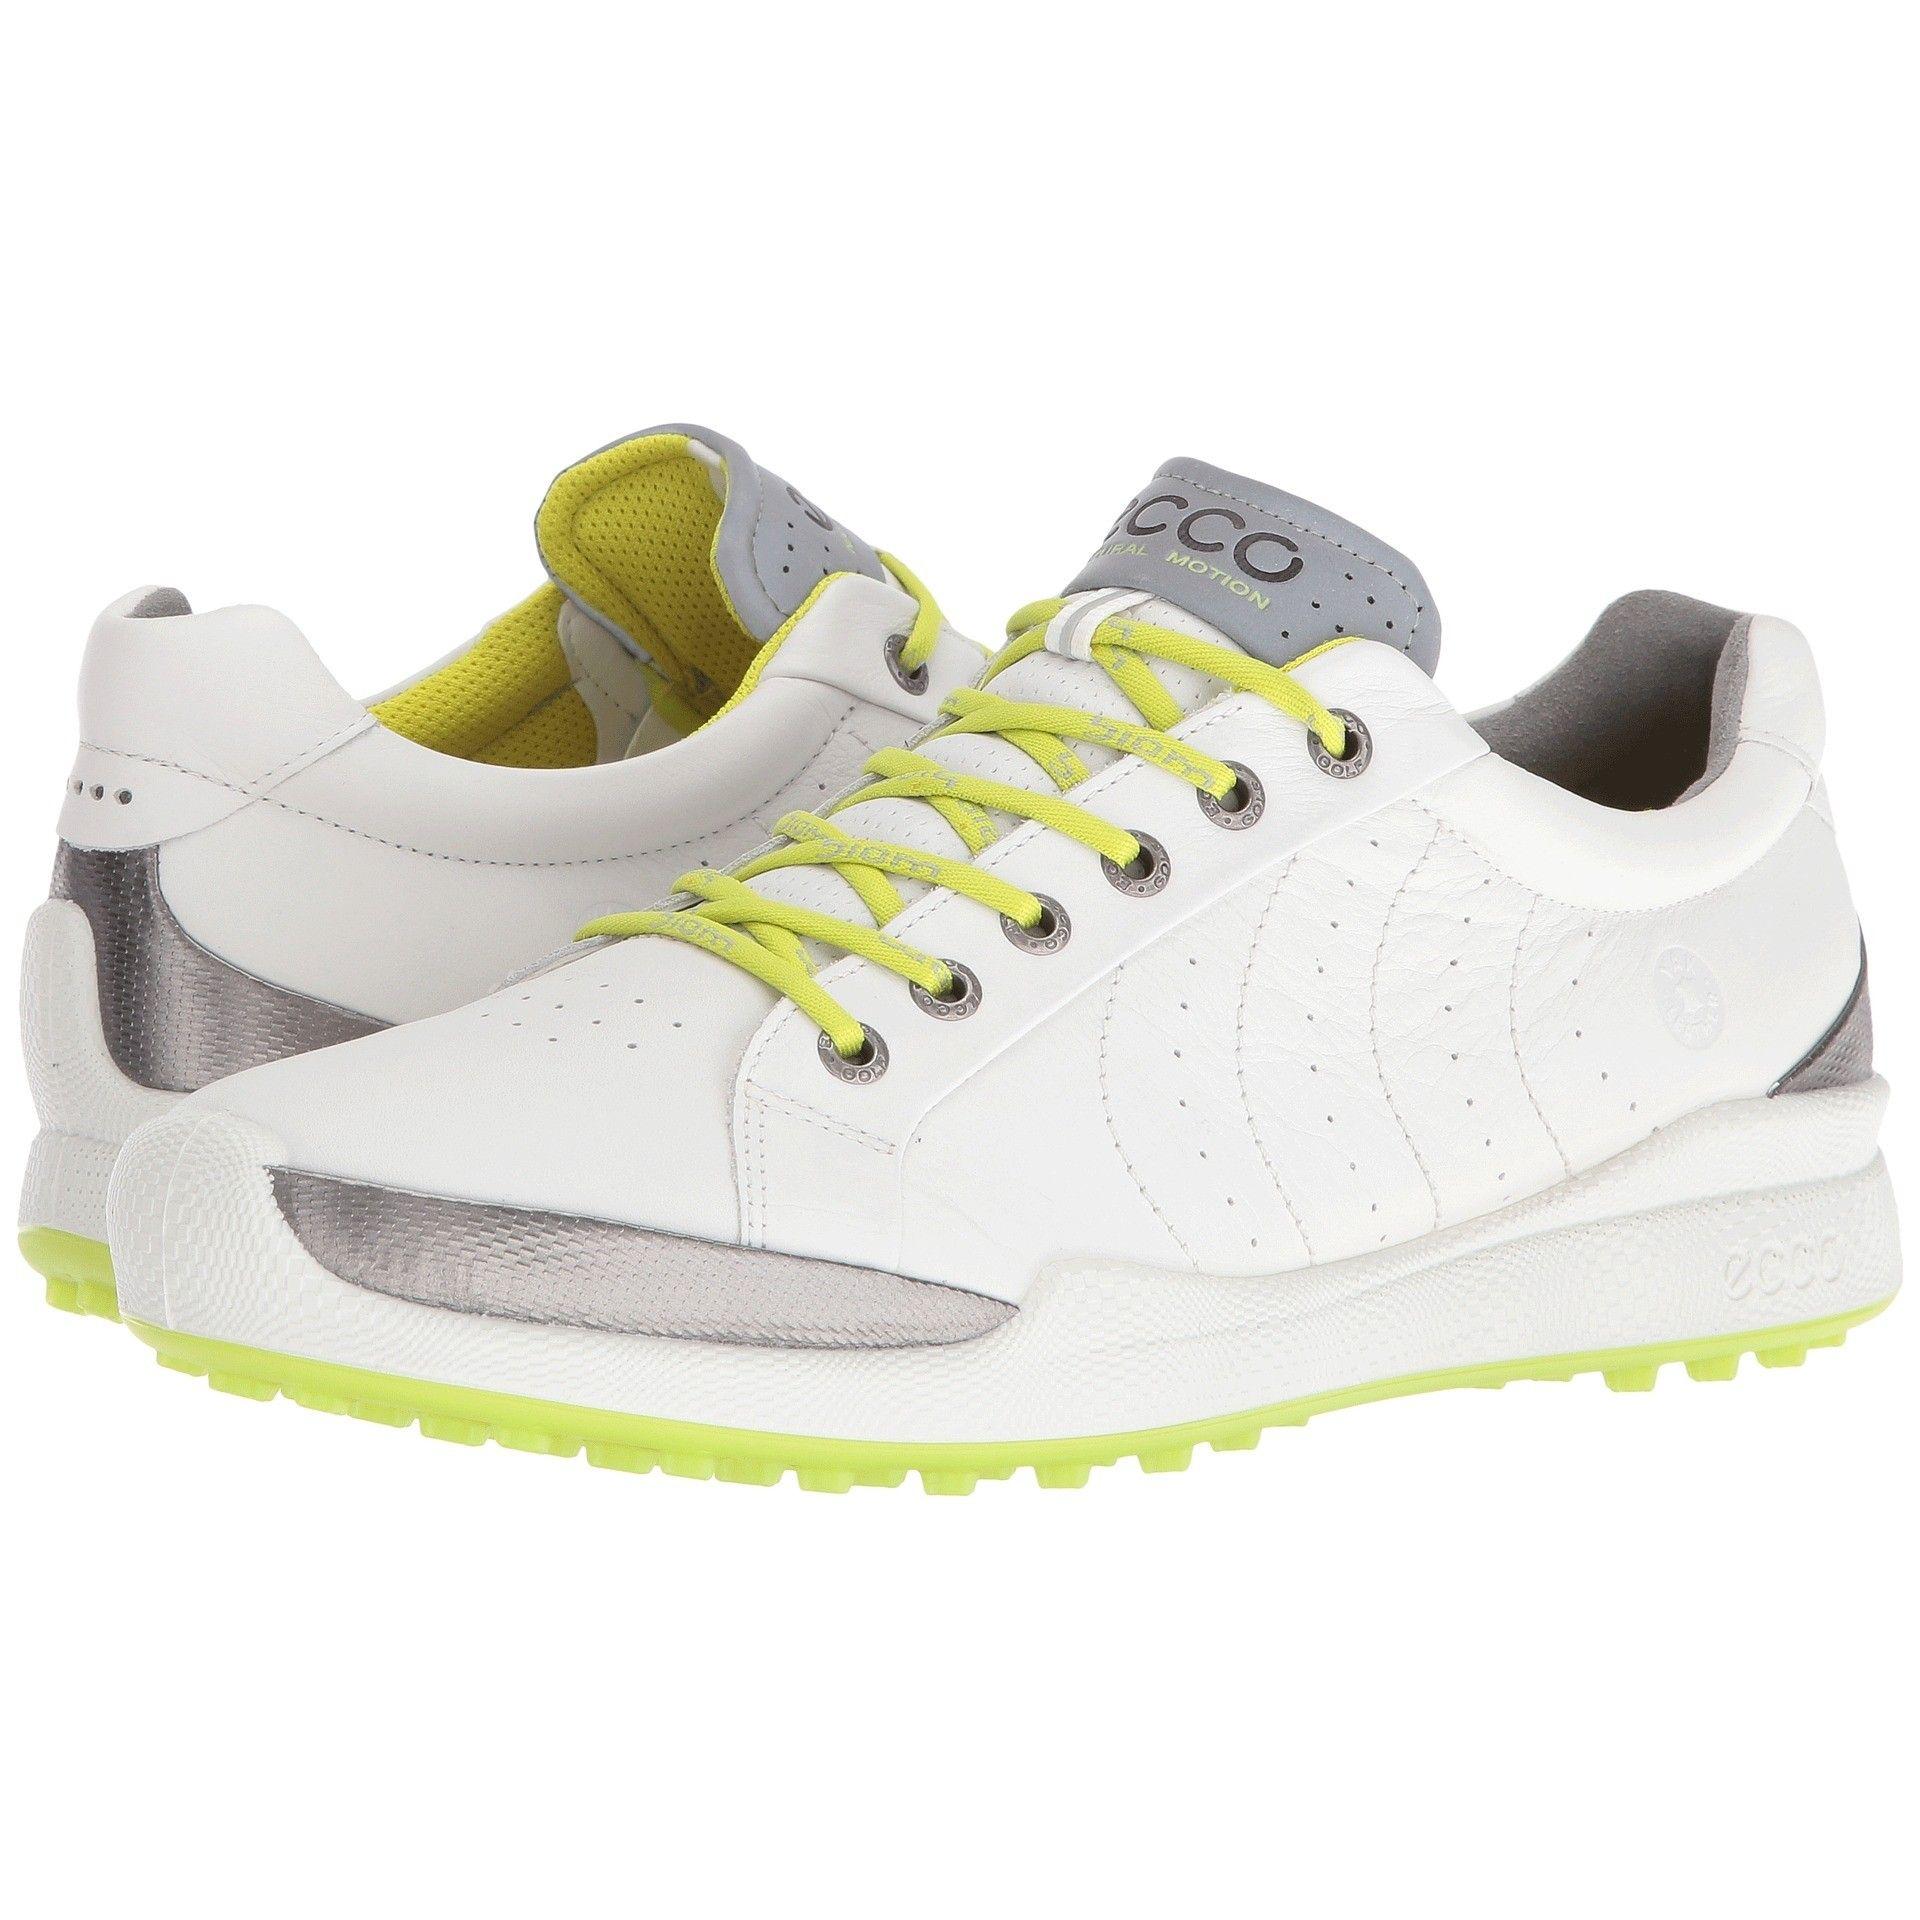 Ecco Ladies Summer Golf Shoes